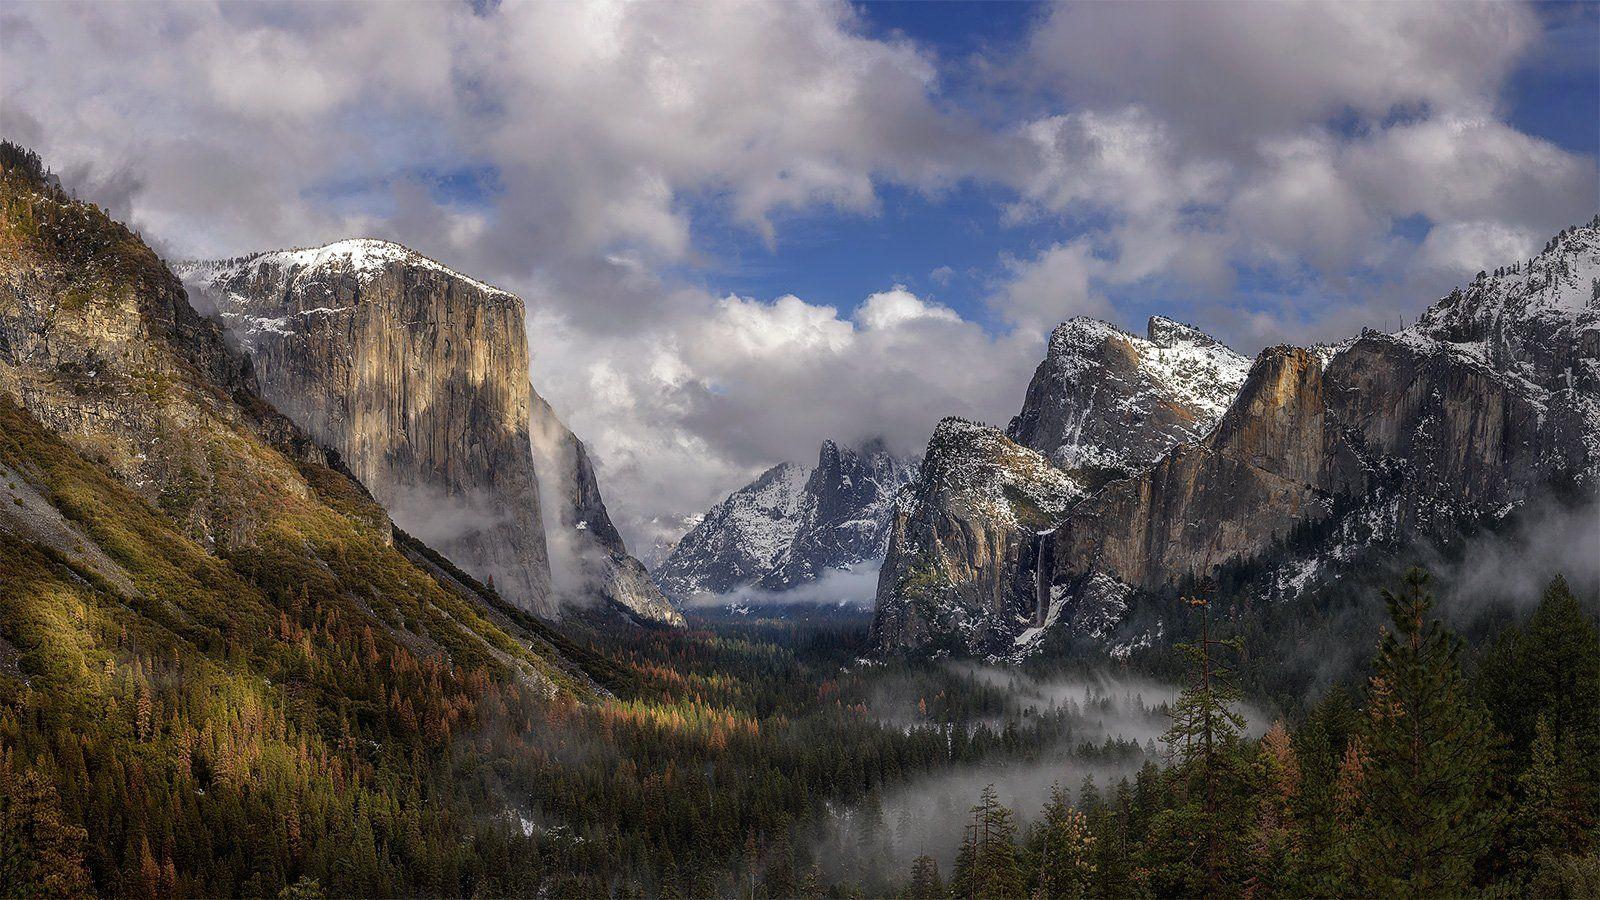 Yosemite, Tunnel View, Дмитрий Титов